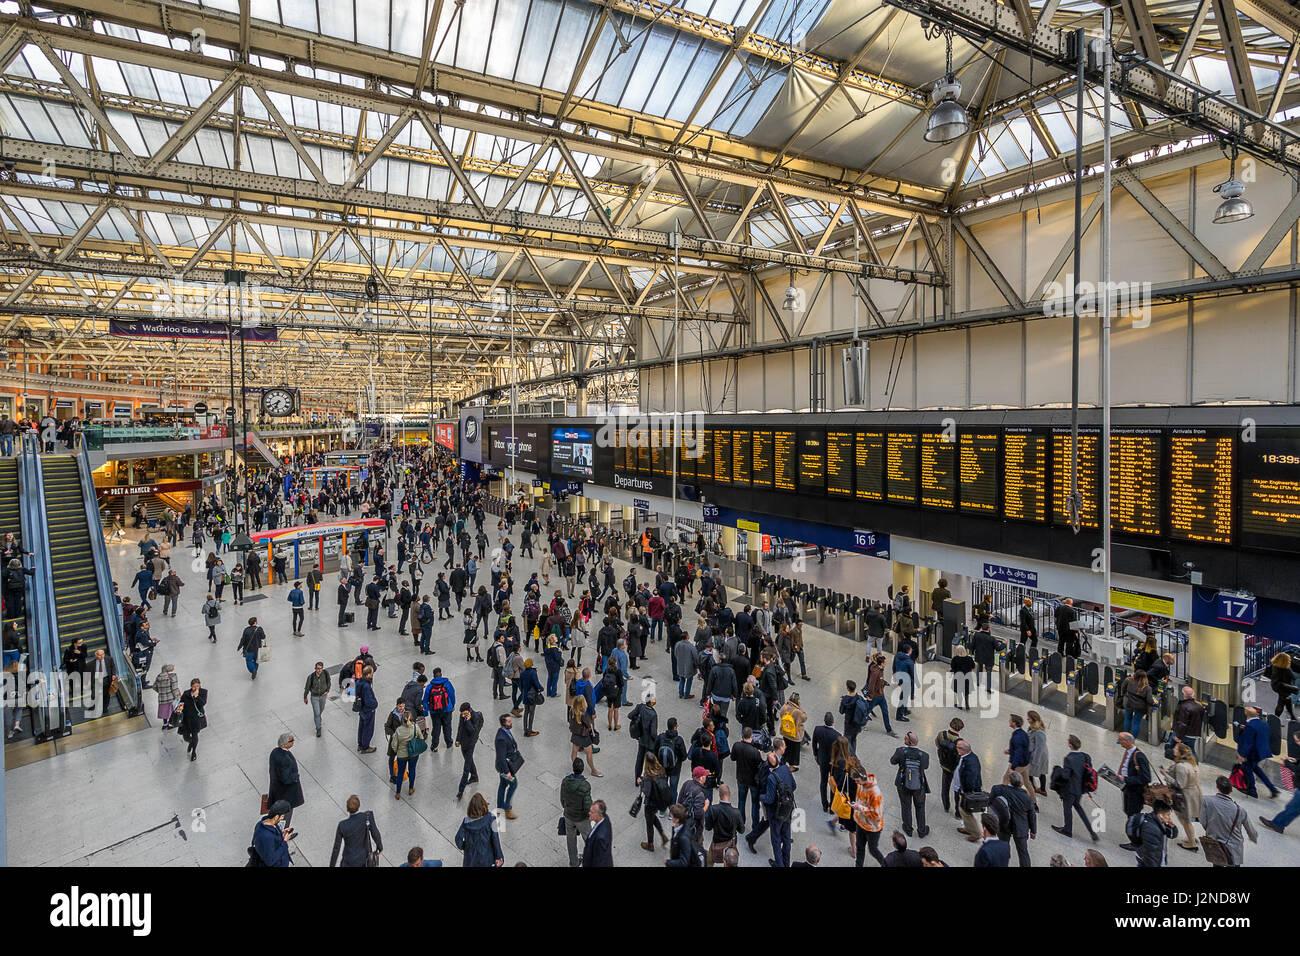 London Waterloo station - Stock Image